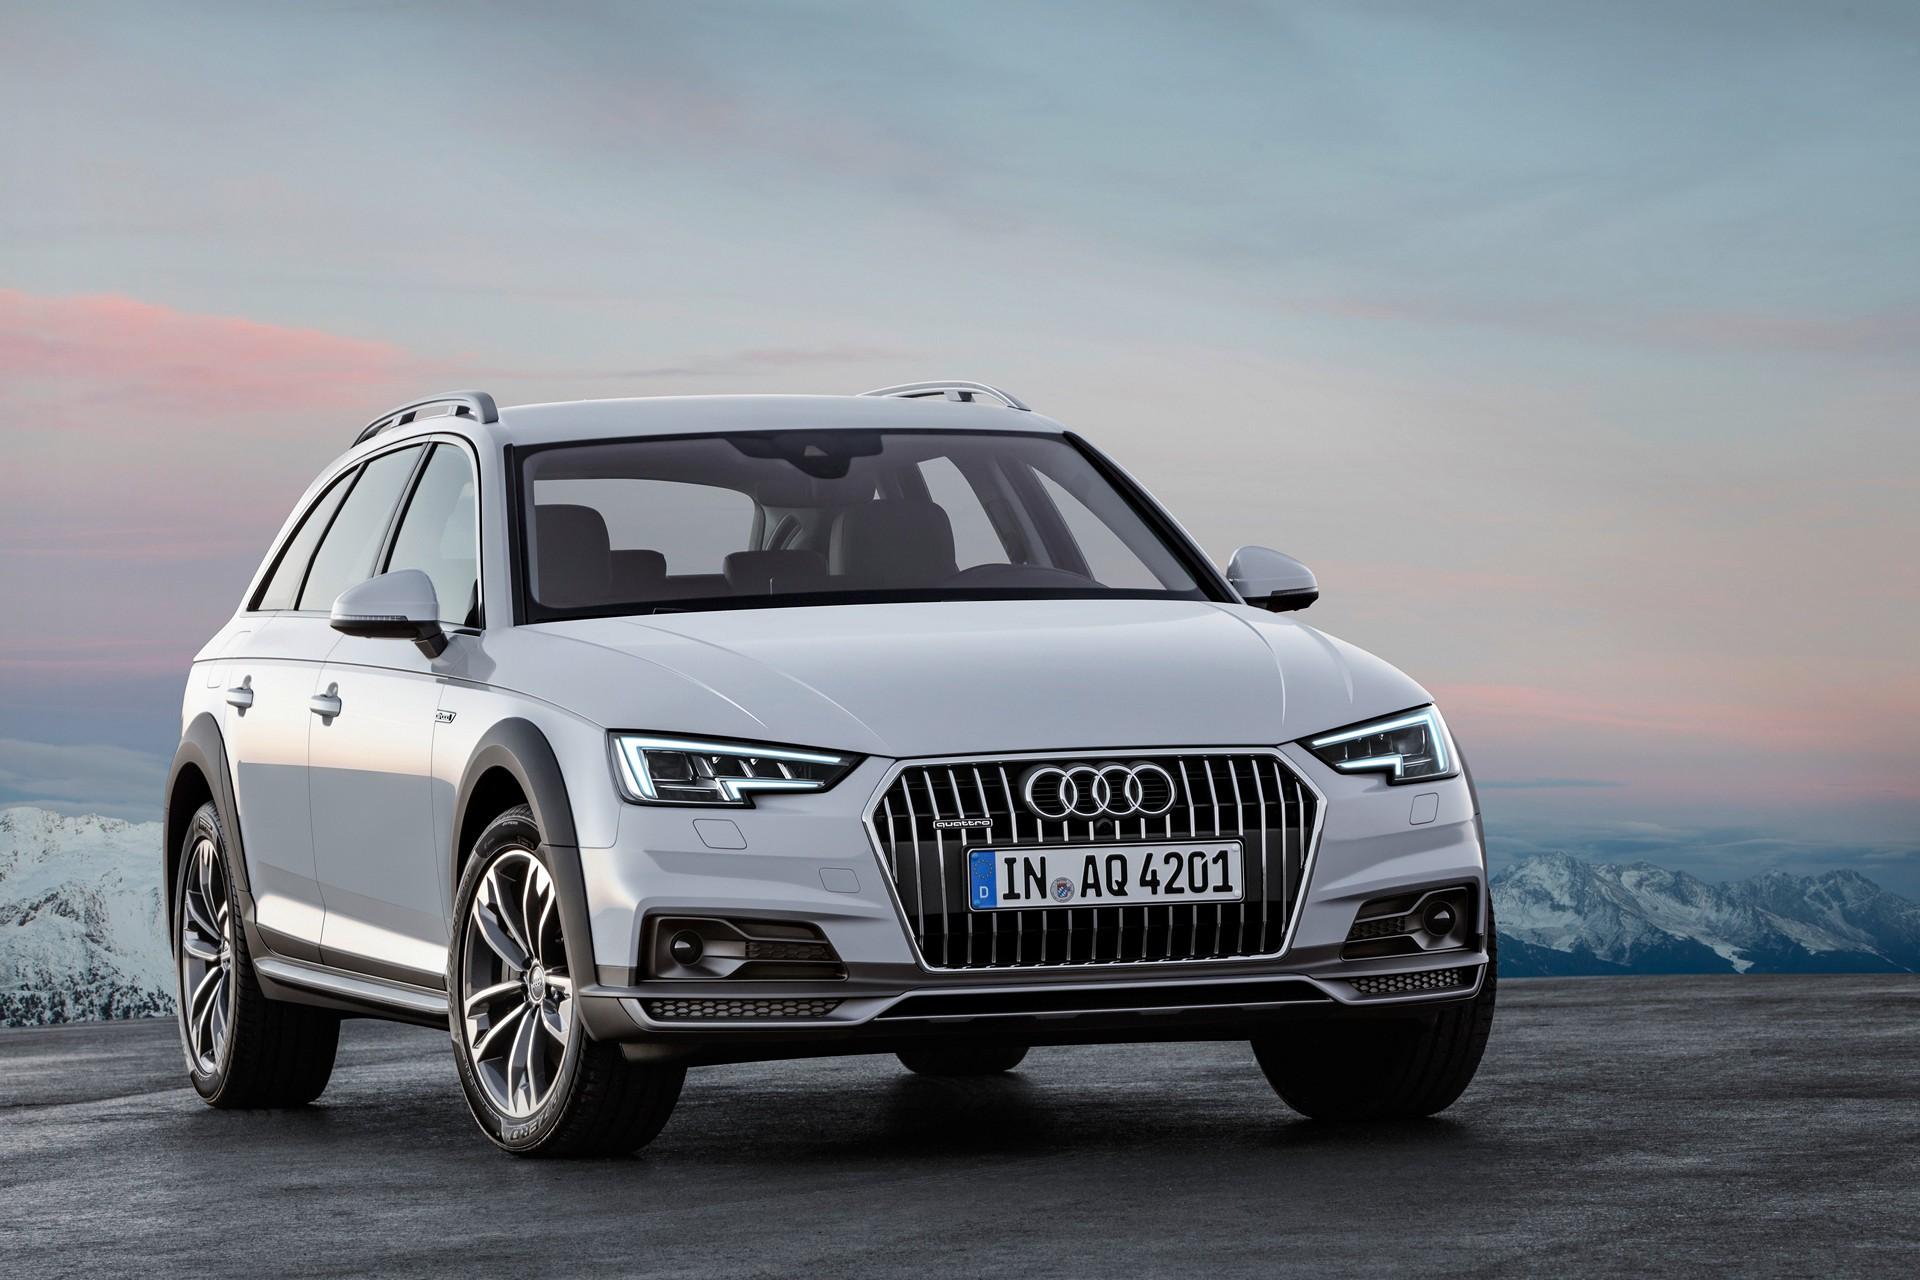 2017 Audi A4 allroad quattro © Volkswagen AG